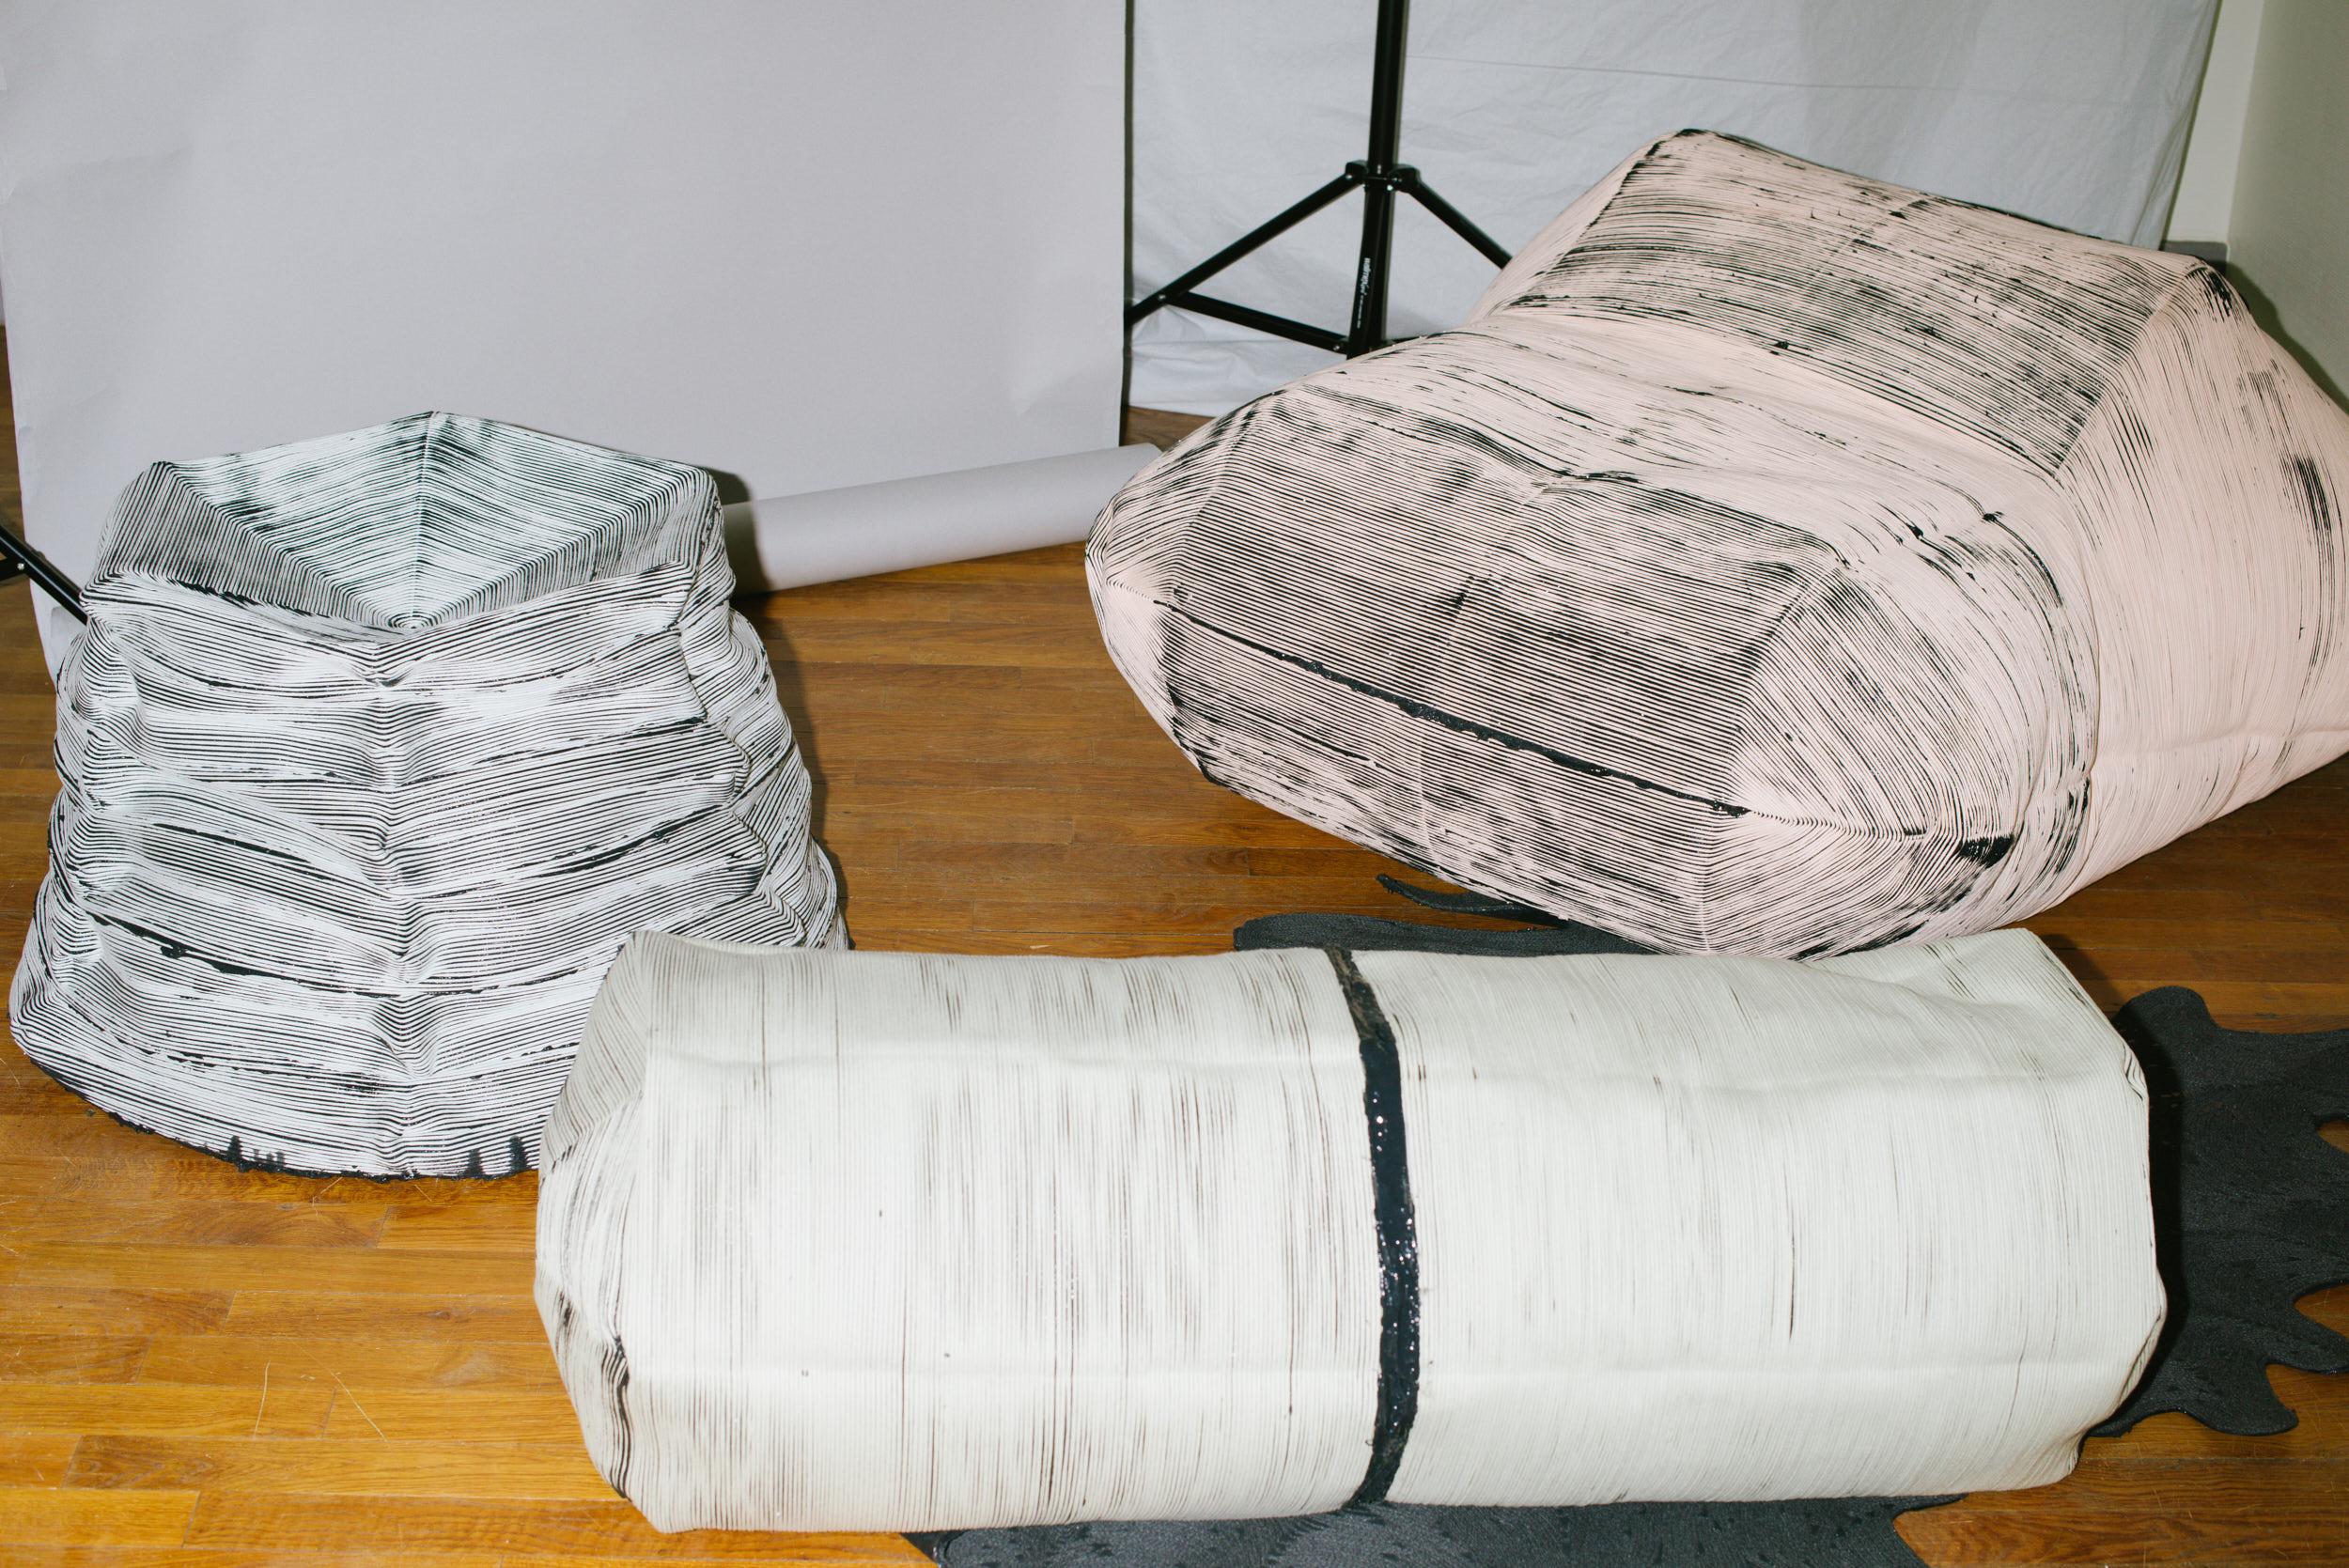 Regen seating elements - Photos by Vanni Bassetti